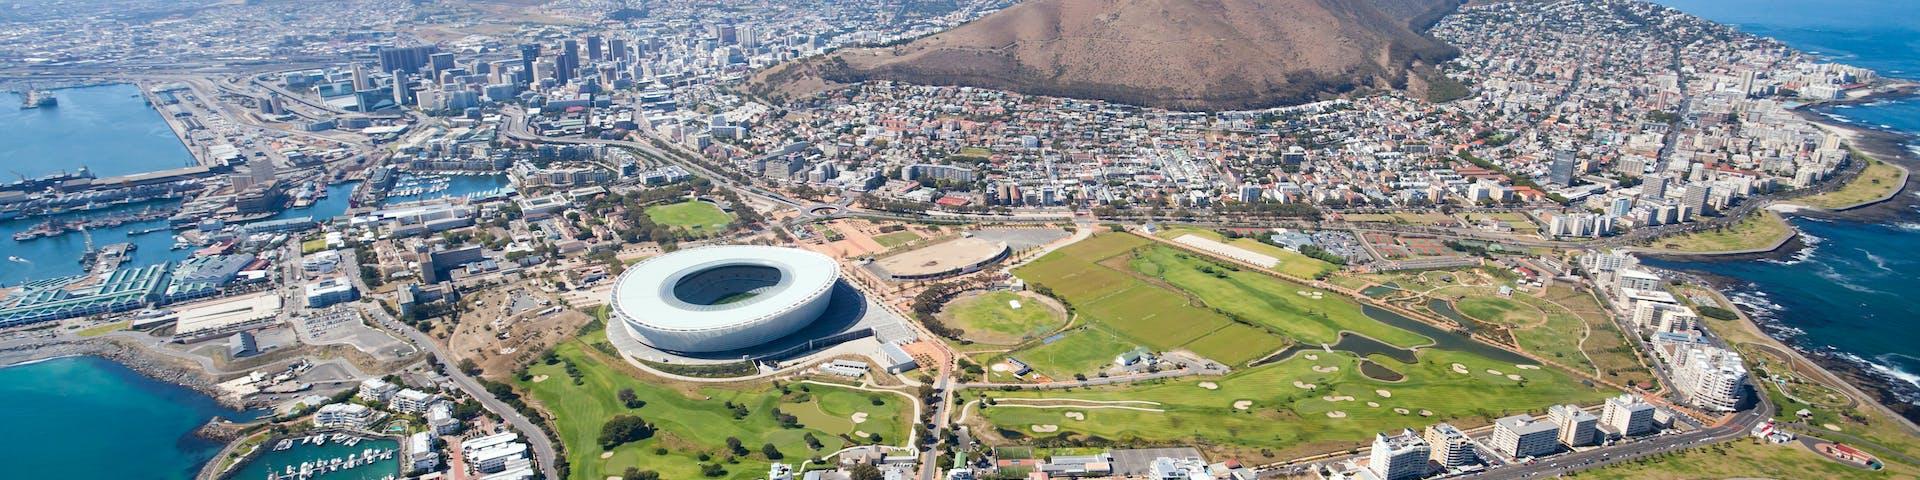 PhD Programmes in Cape Town - South Africa - PhDPortal com